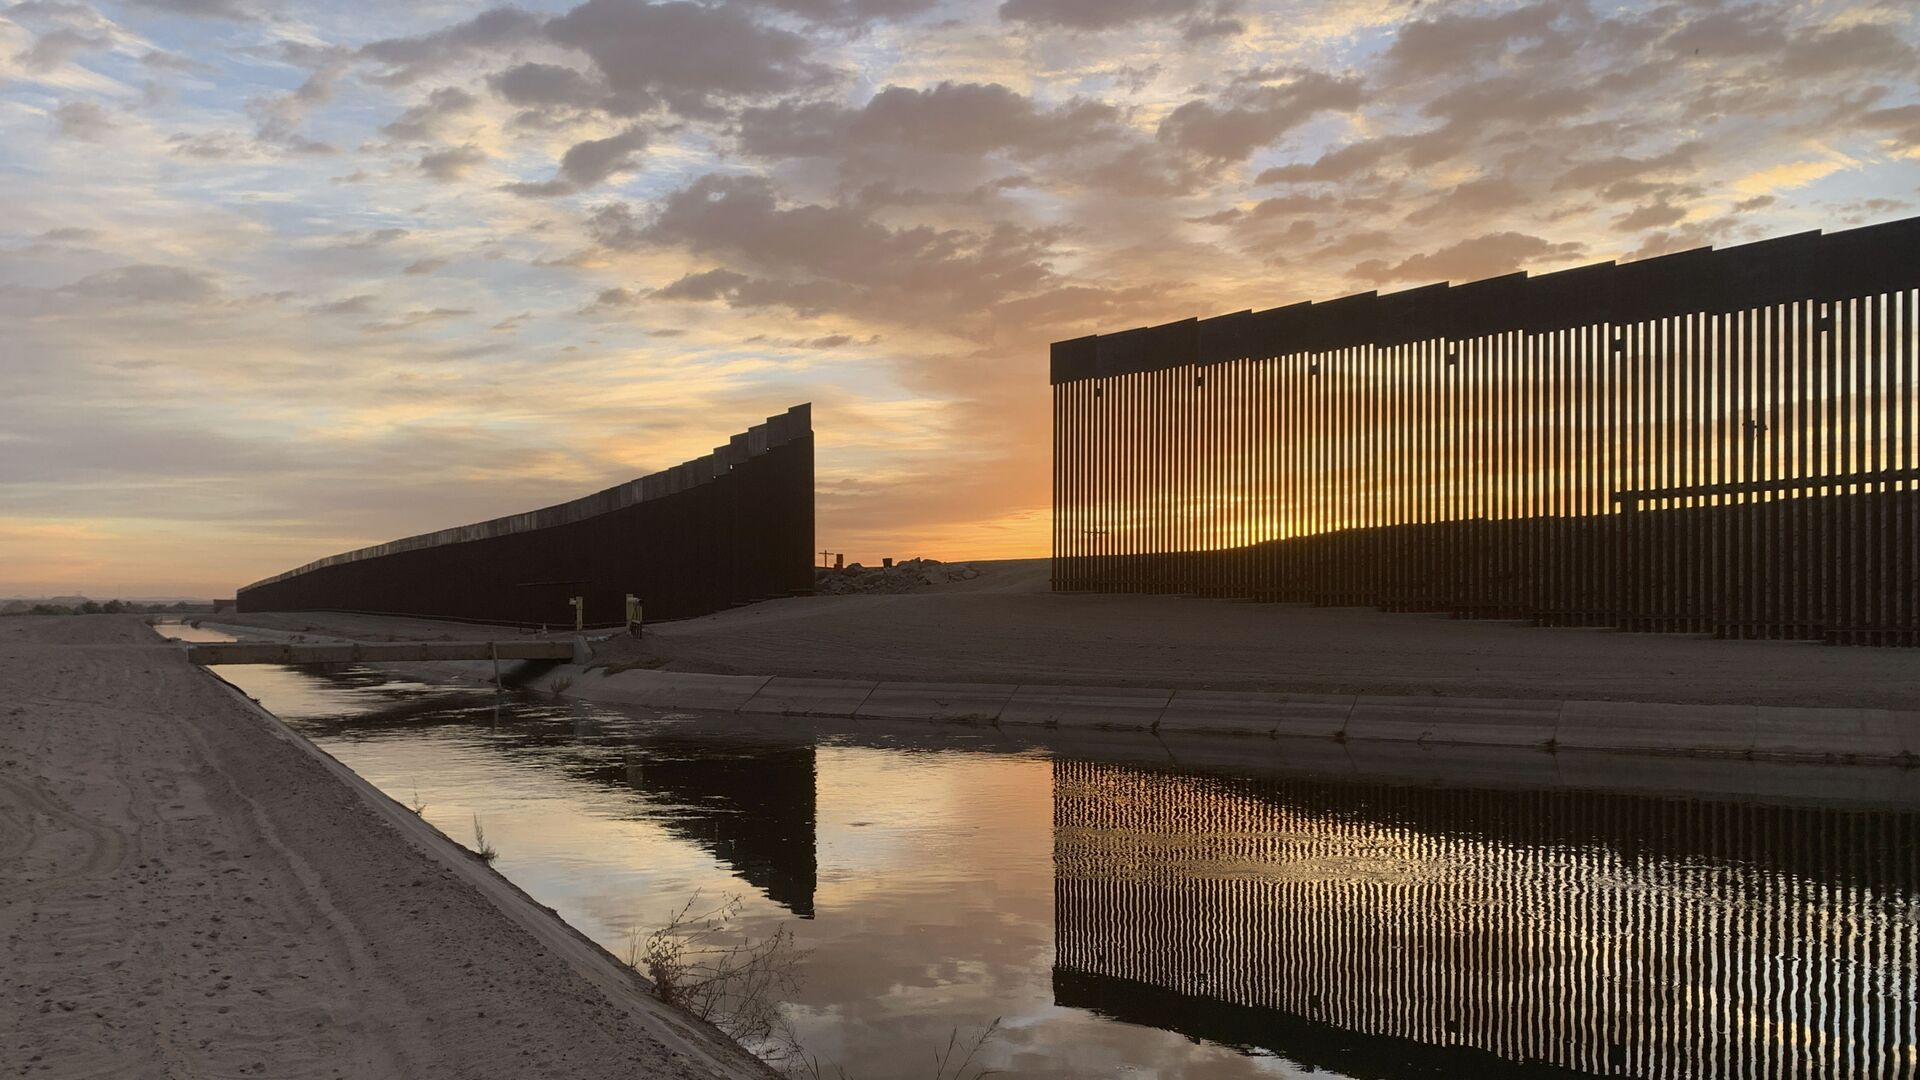 The sun sets above the U.S.-Mexico border wall, seen in Yuma, Ariz., Wednesday, June 9, 2021. - Sputnik International, 1920, 26.09.2021